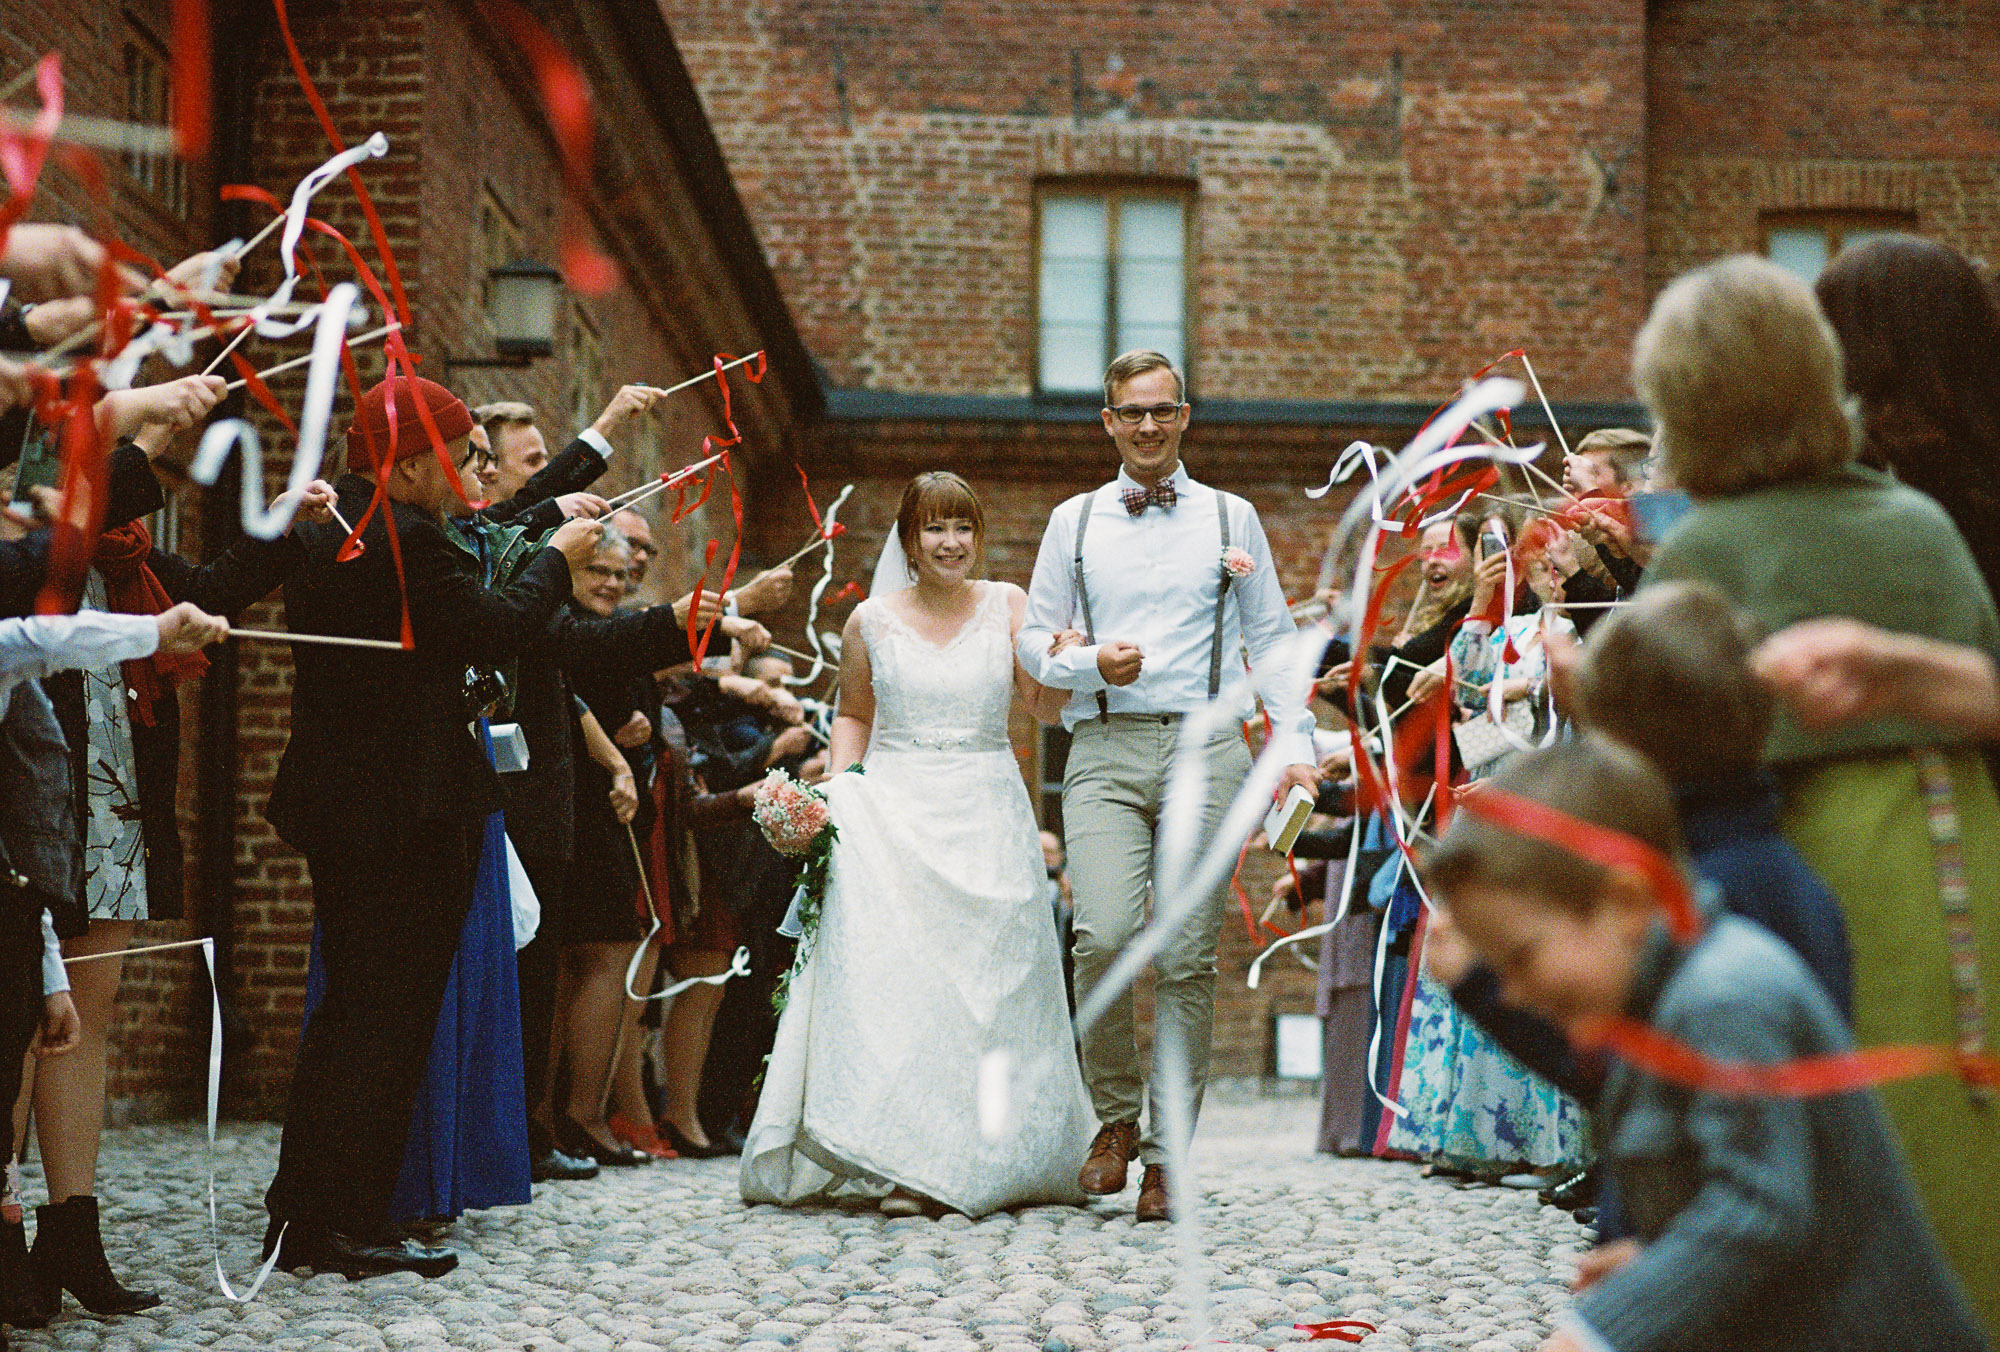 jere-satamo-analog-film-wedding-photographer-finland-274.jpg